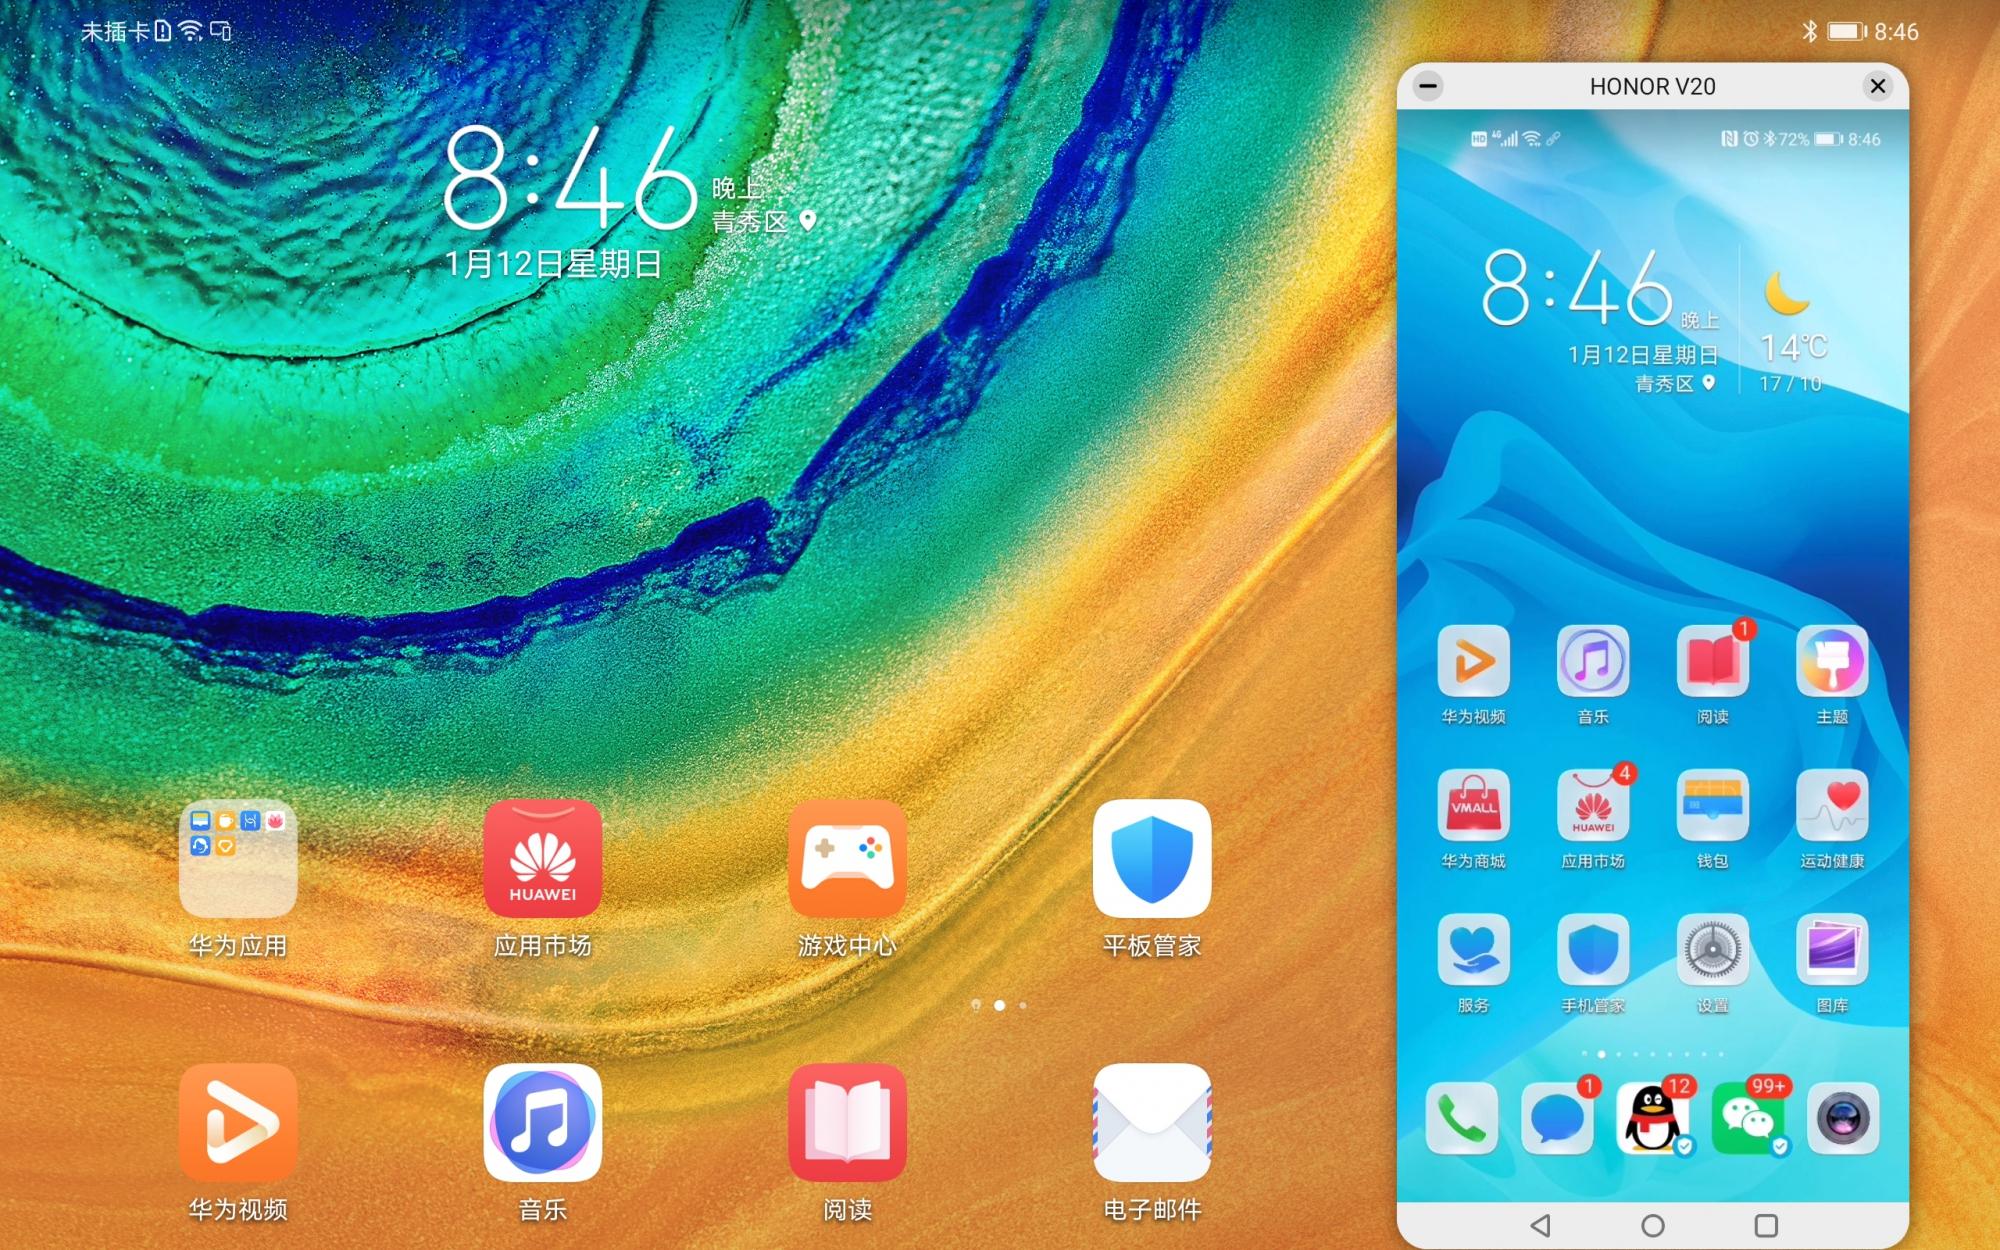 Screenshot_20200112_204637_com.huawei.android.lau.jpg